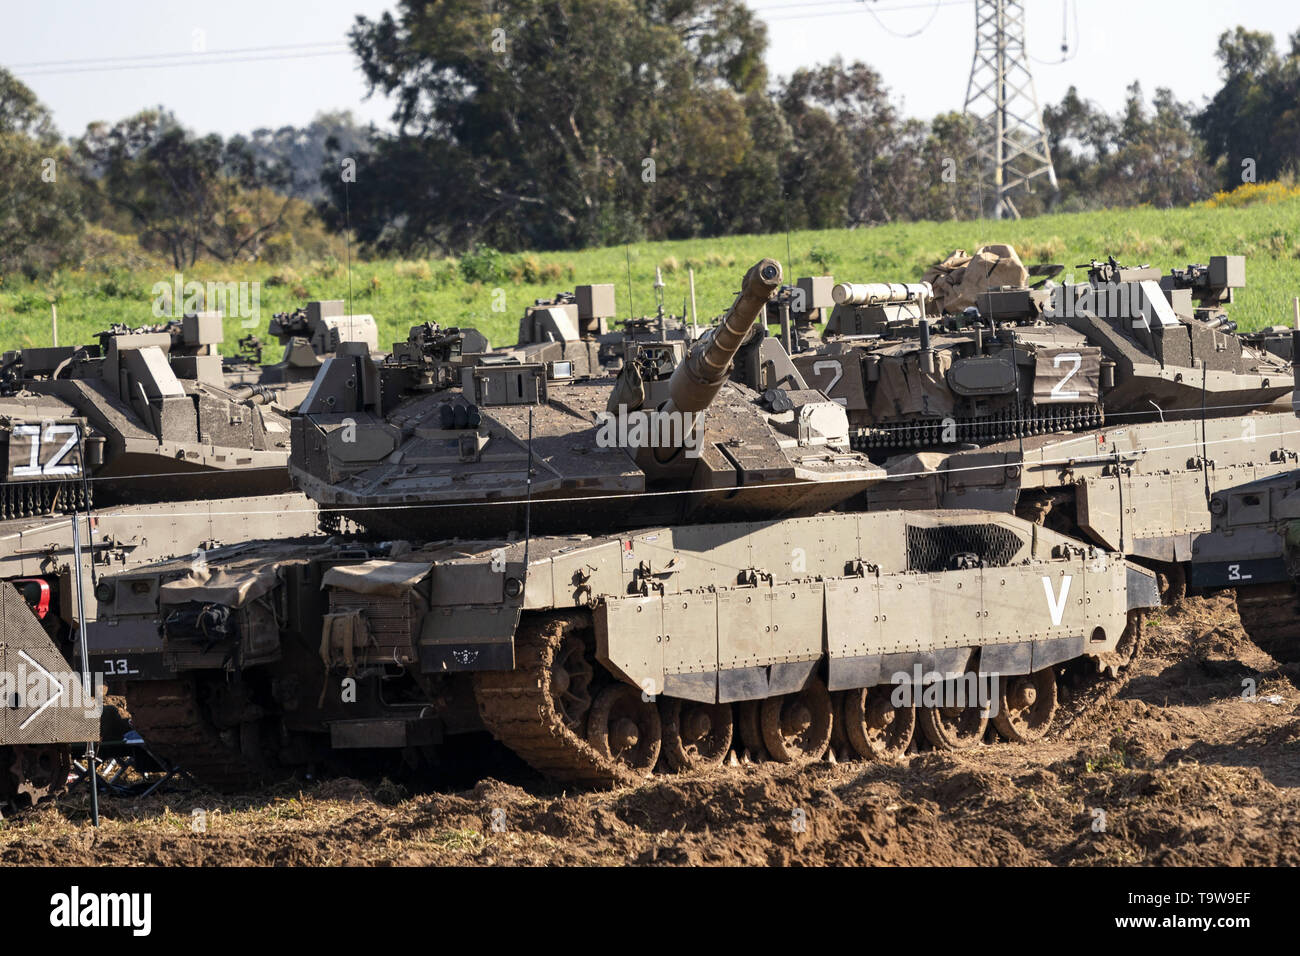 Nahal Oz, Israel  5th Apr, 2019  Israeli military vehicles